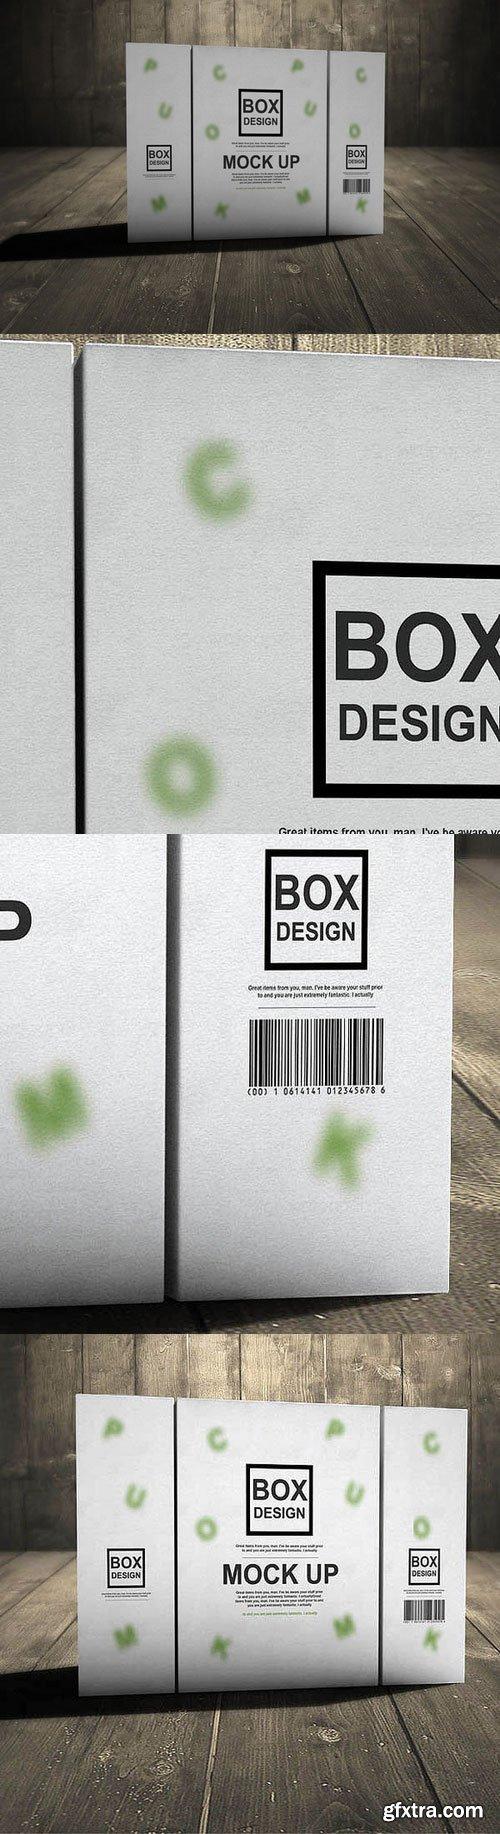 CM - 3D Product Box Mock Up 335351